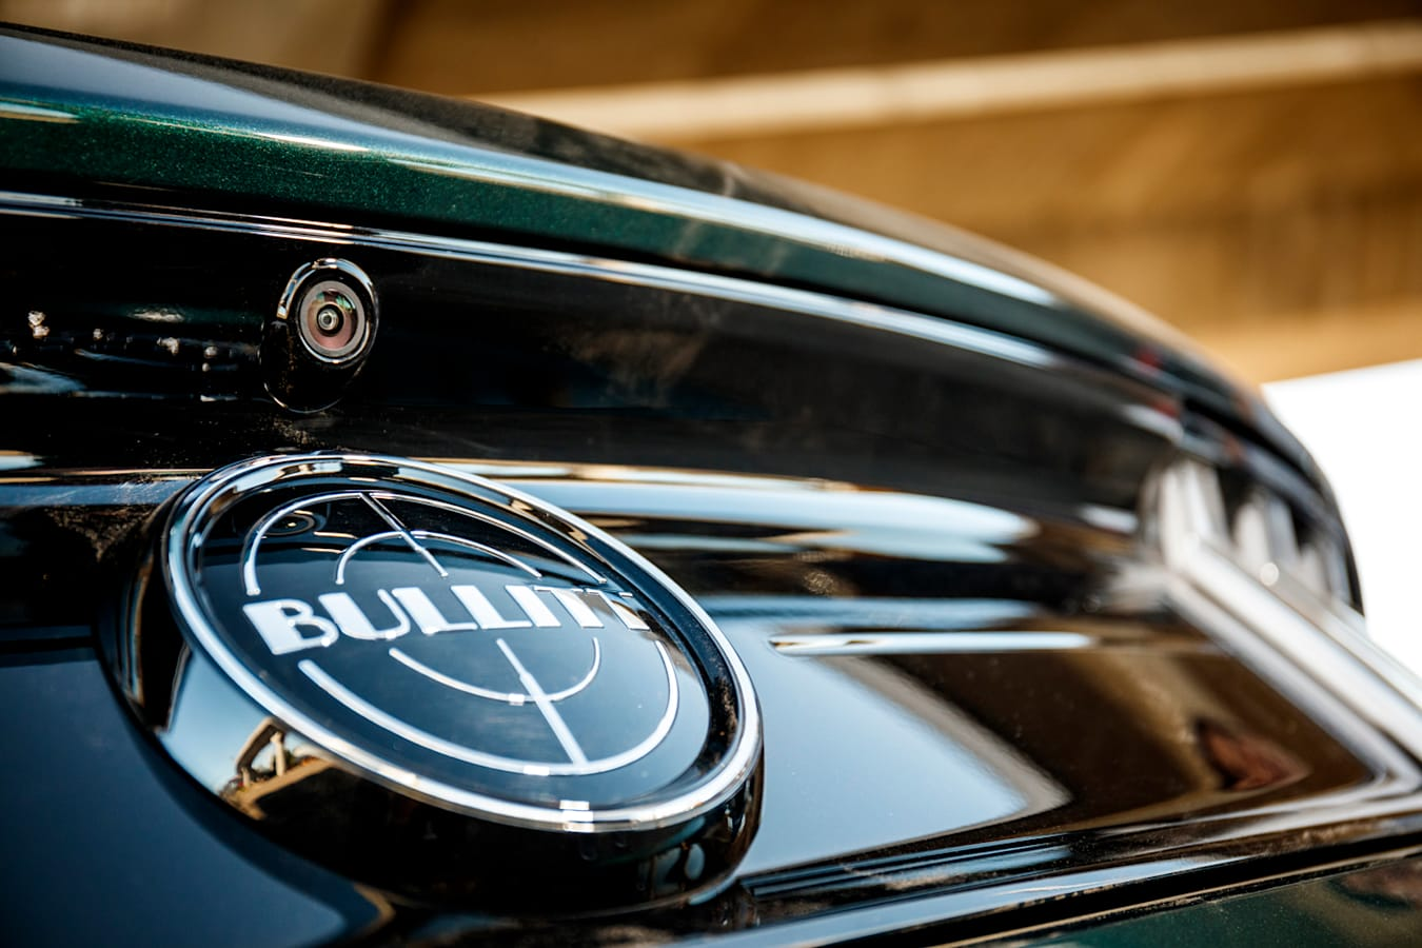 Bullitt Mustang badge